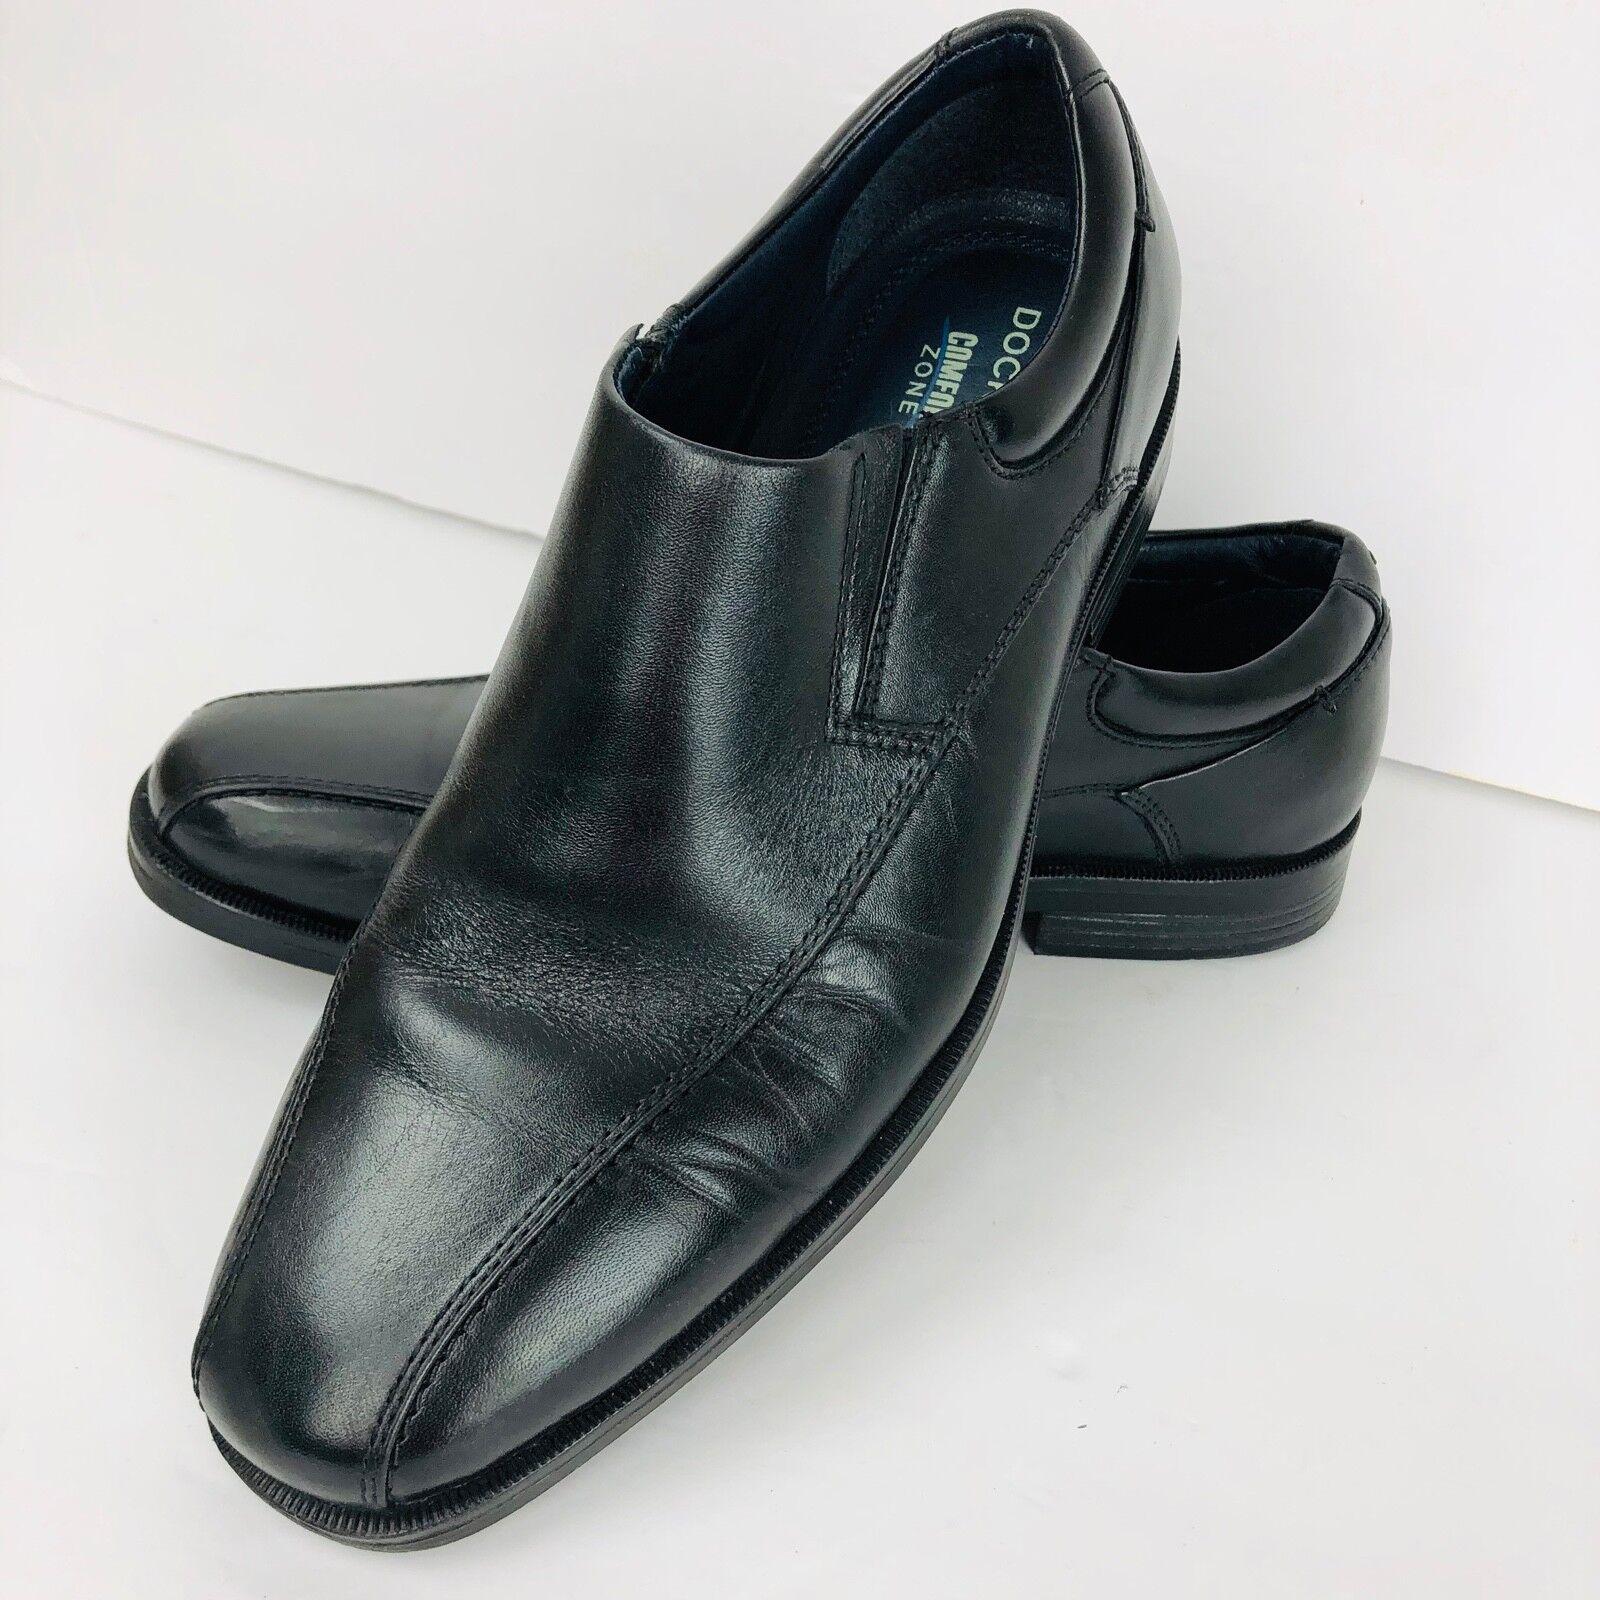 Dockers Mens Worden Business Dress SlipOn Loafer shoes Black Comfort Features 8.5